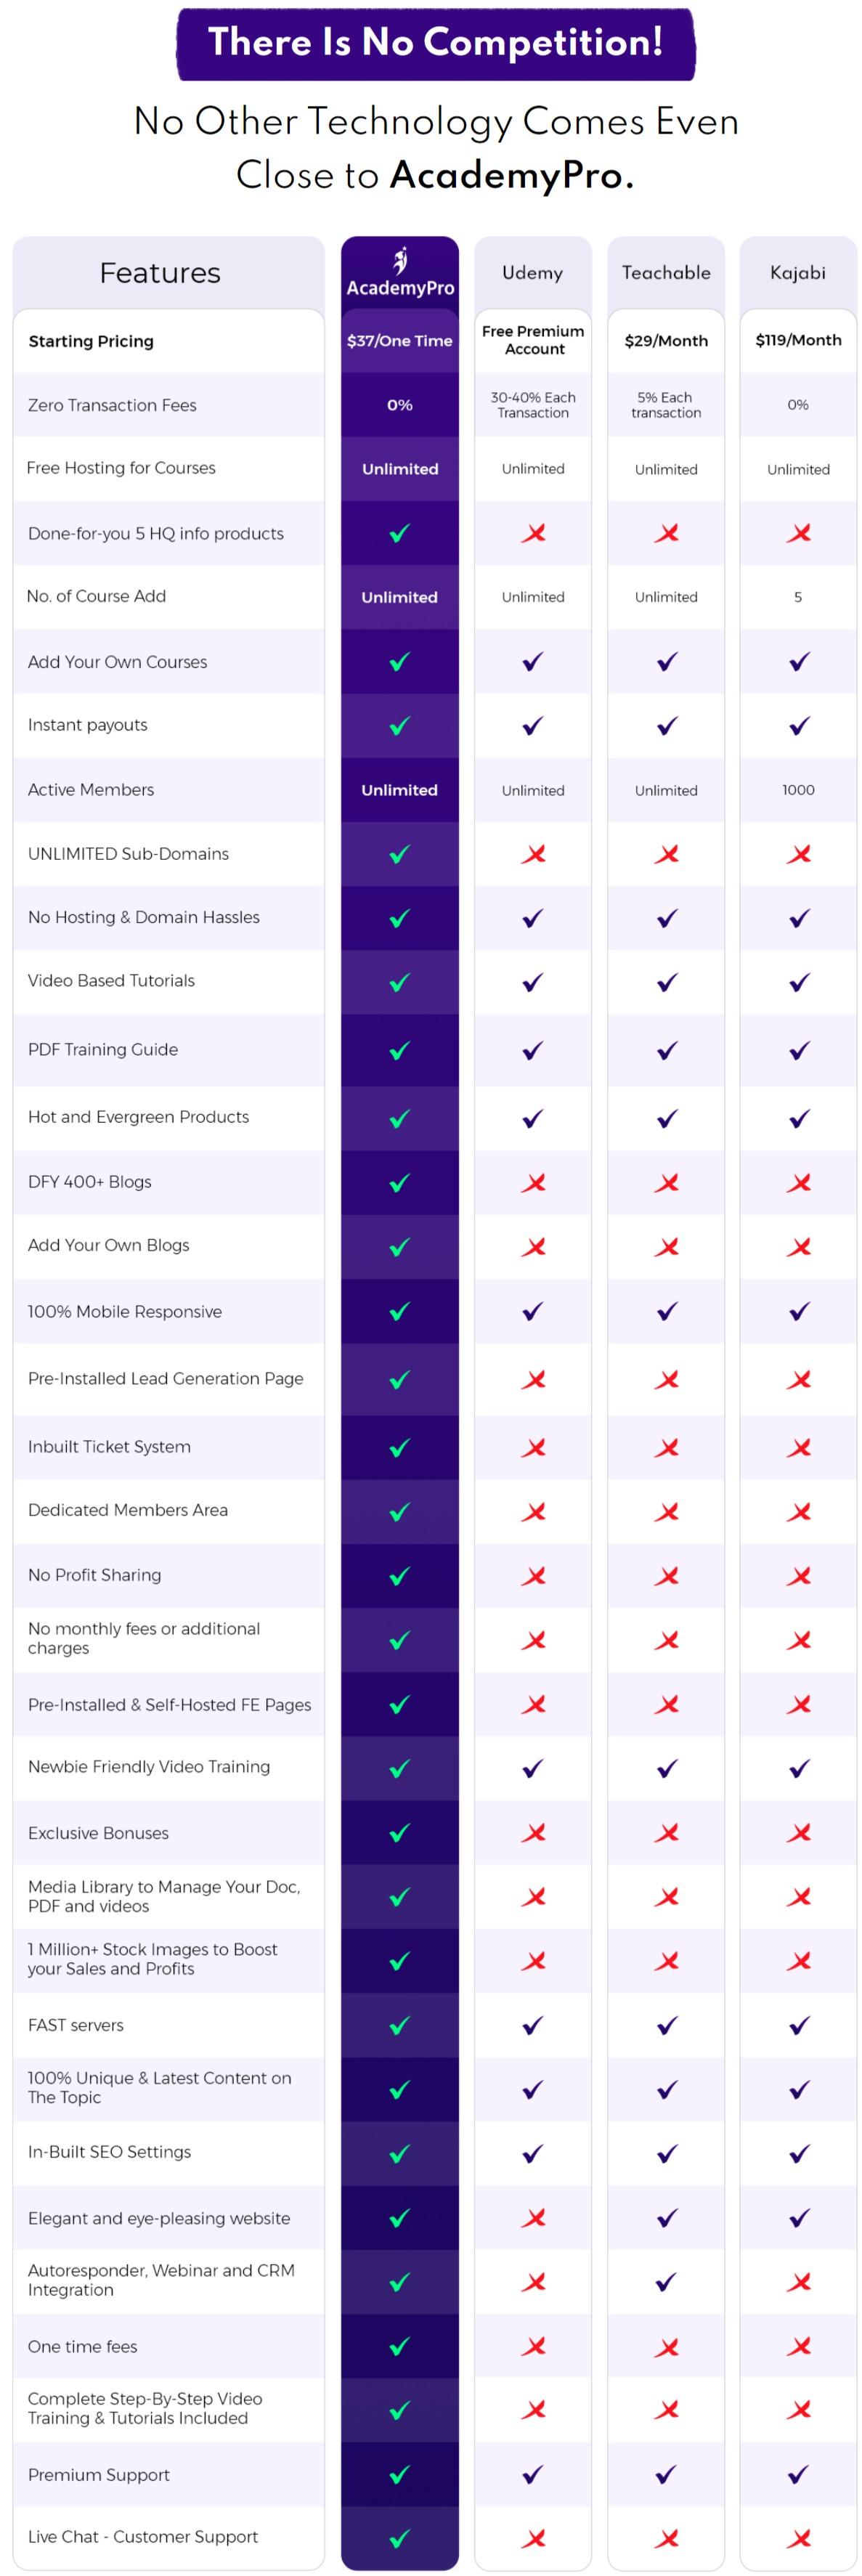 AcademyPro 2.0 comparison